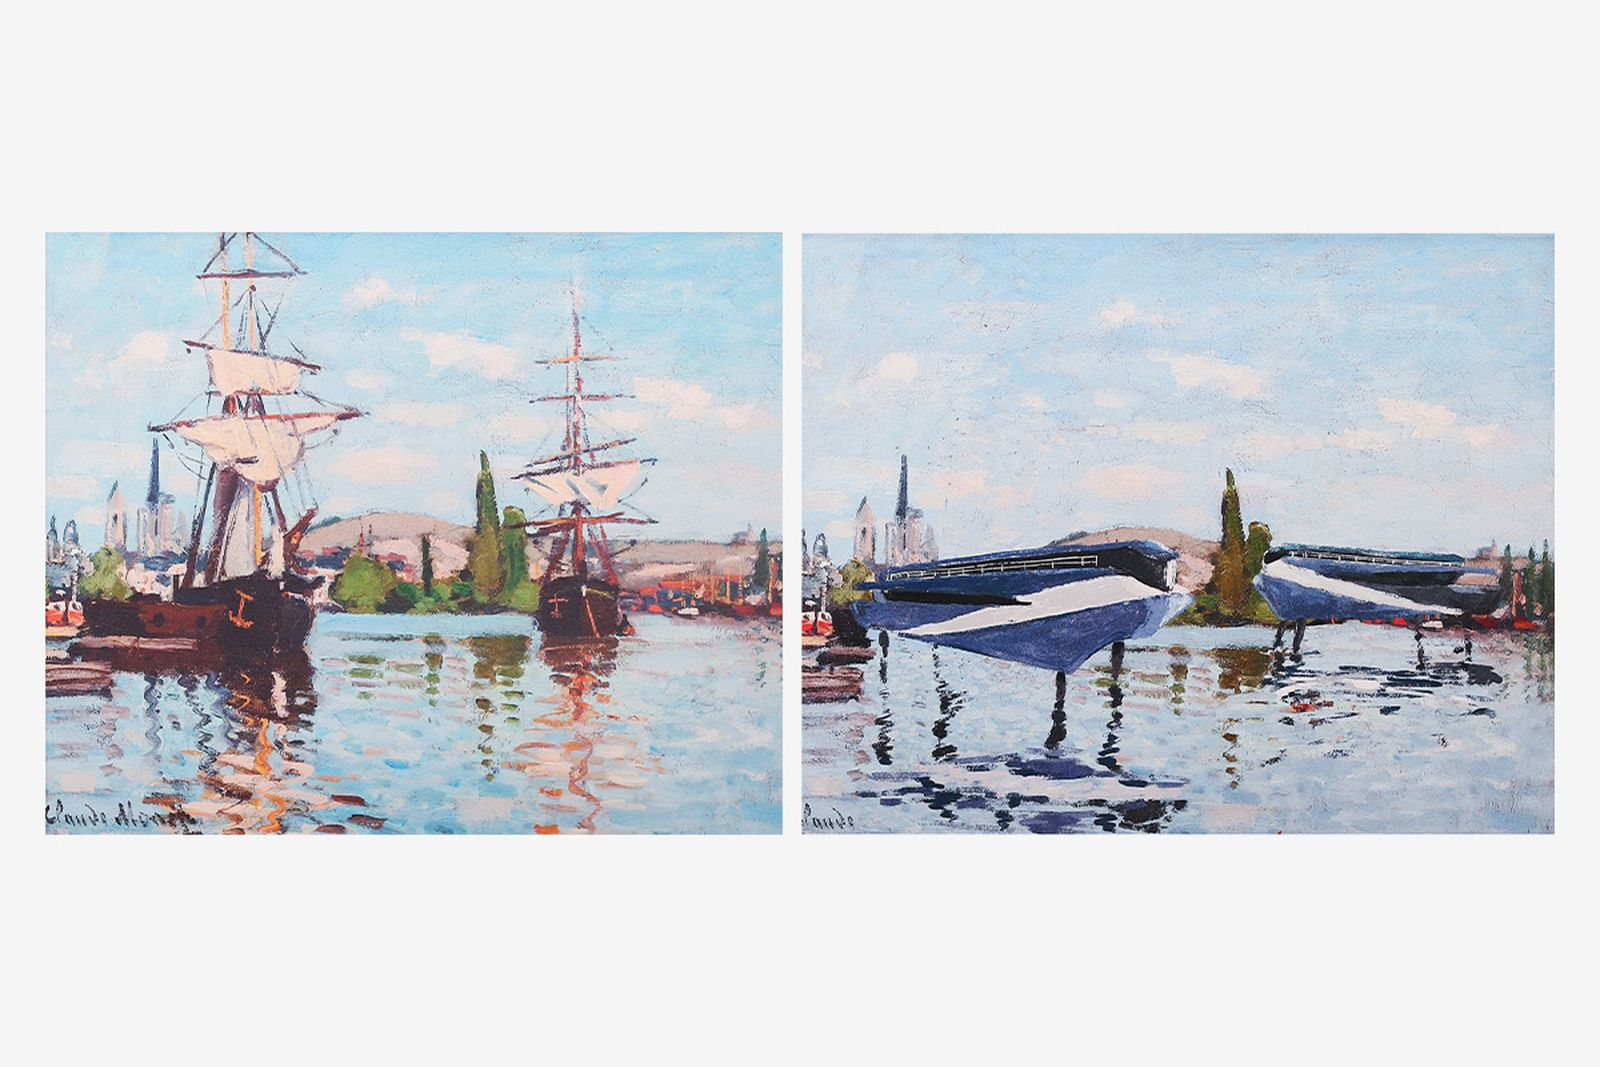 reuben-dangoor-taps-the-great-masters-to-imagine-future-seascapes-02